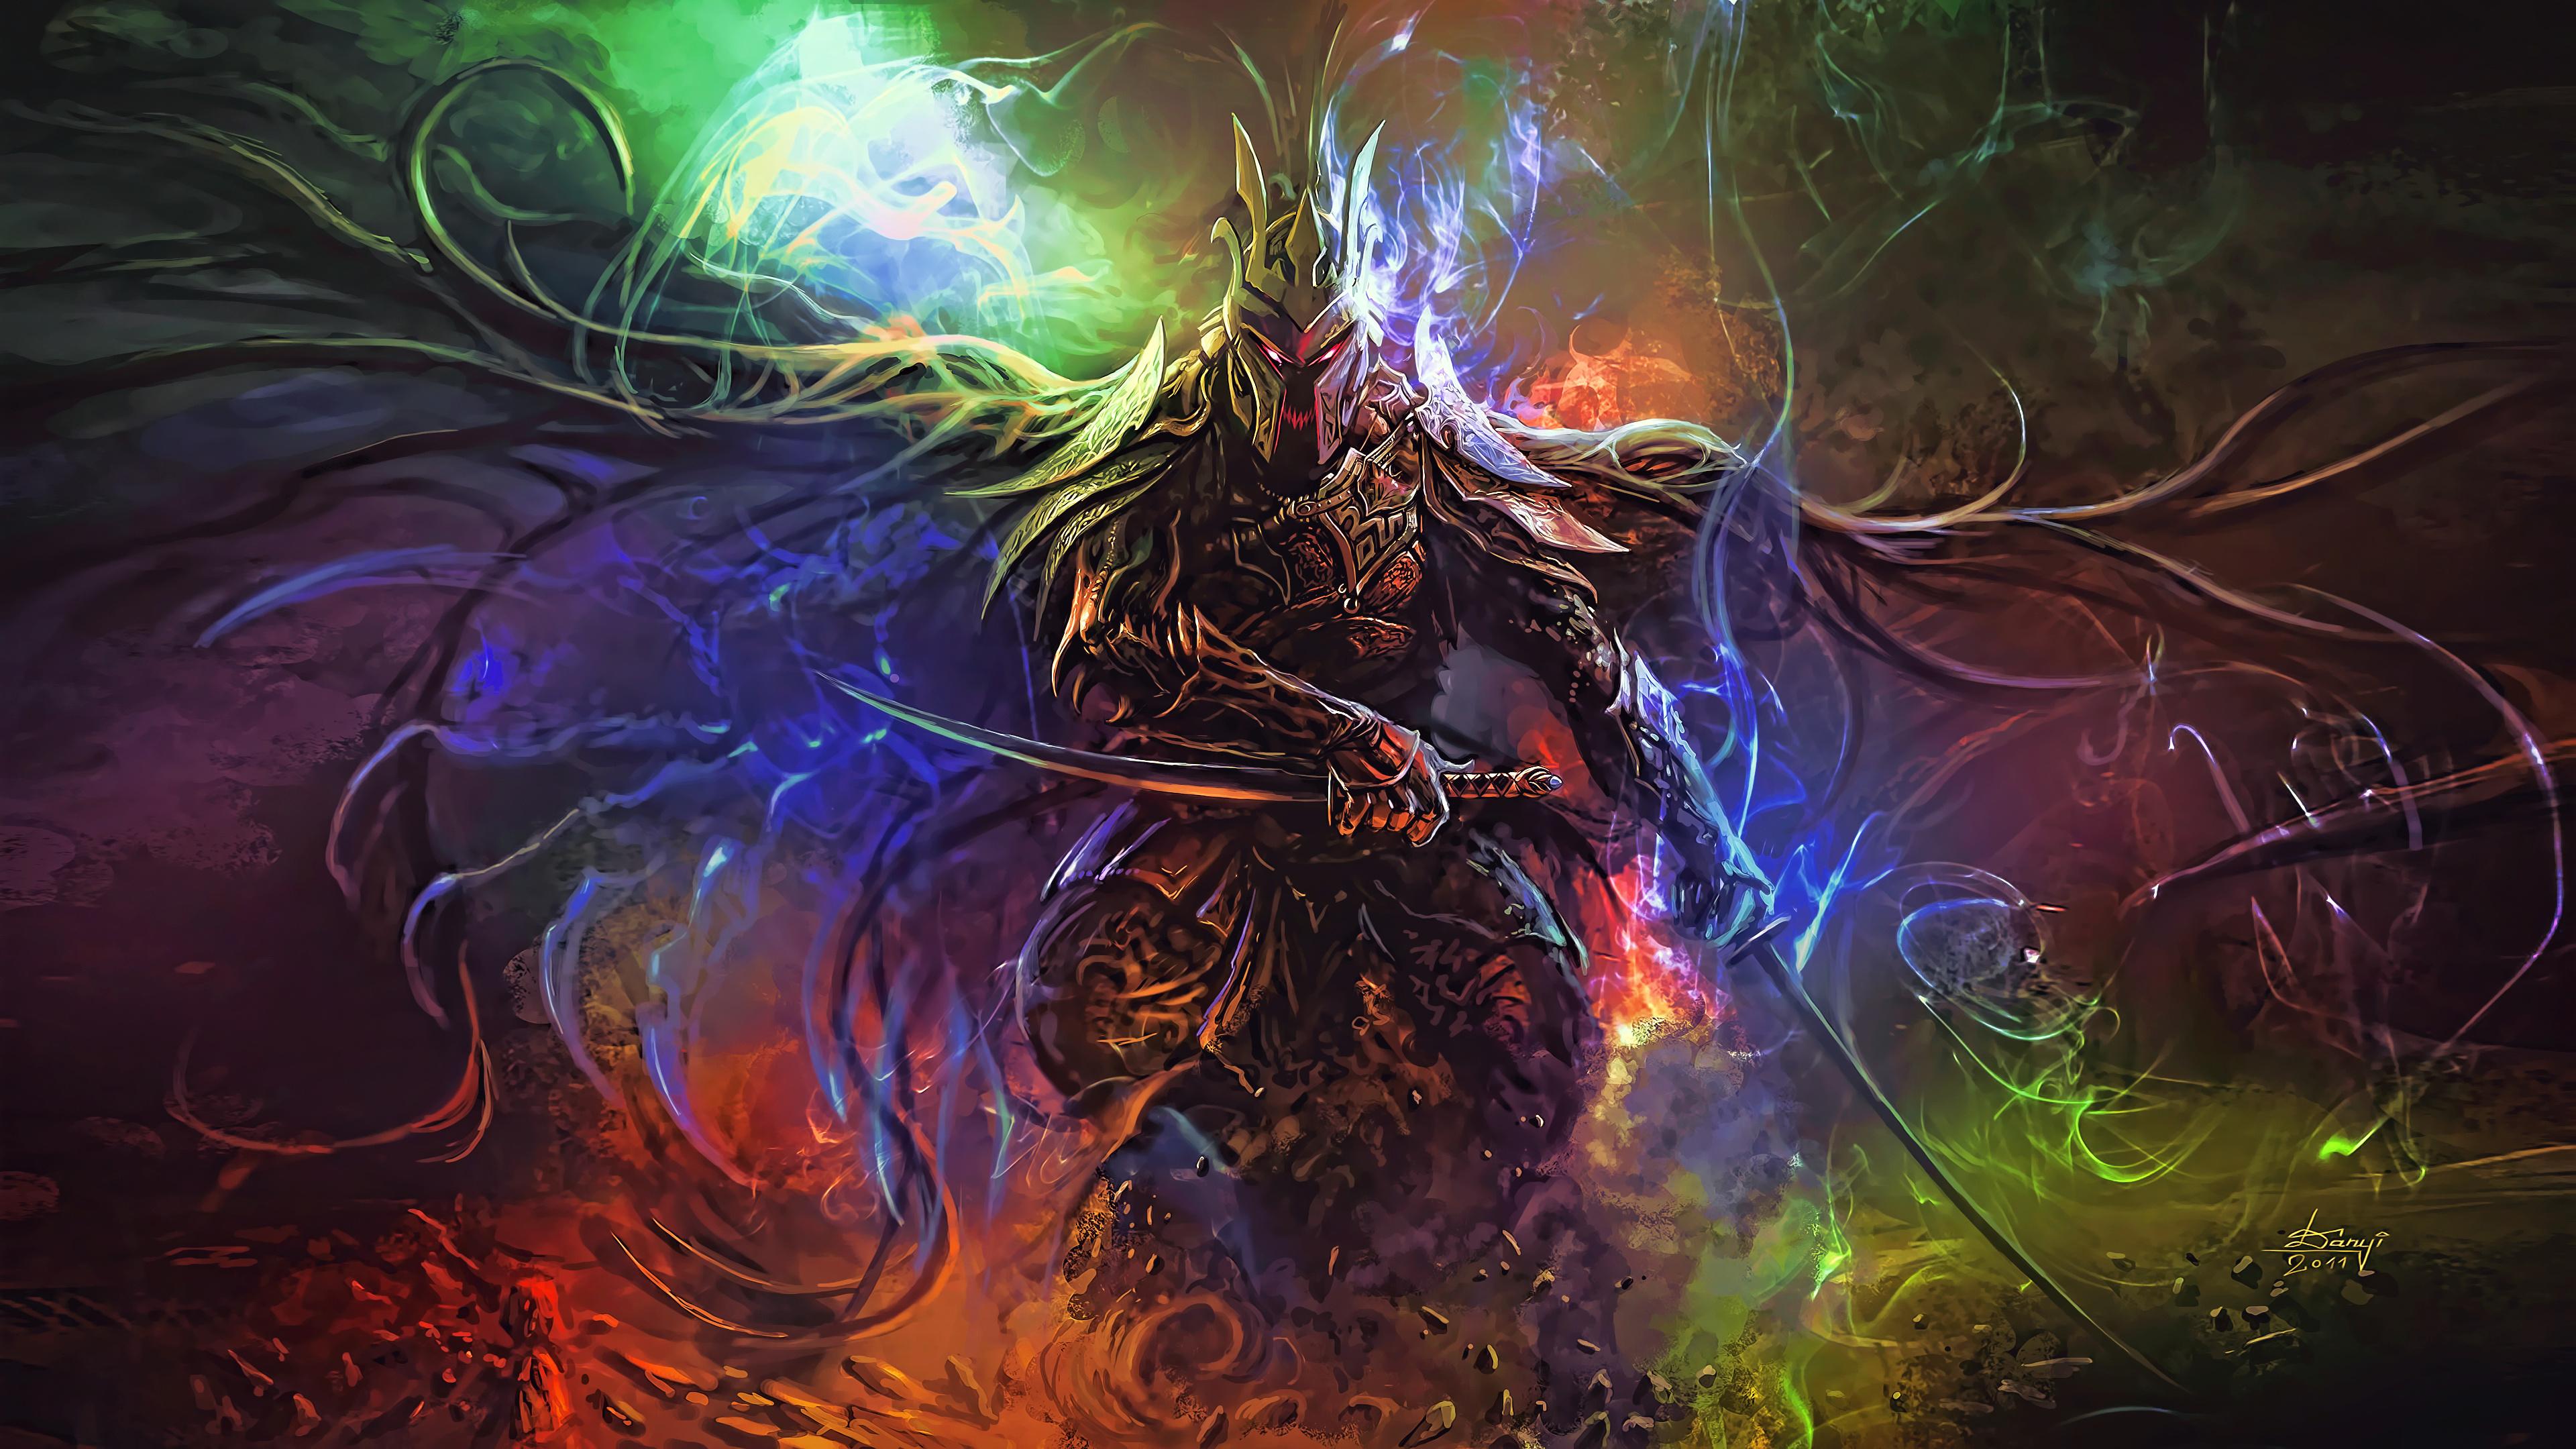 Download 3840x2400 Wallpaper Fantasy Art Warrior 4k